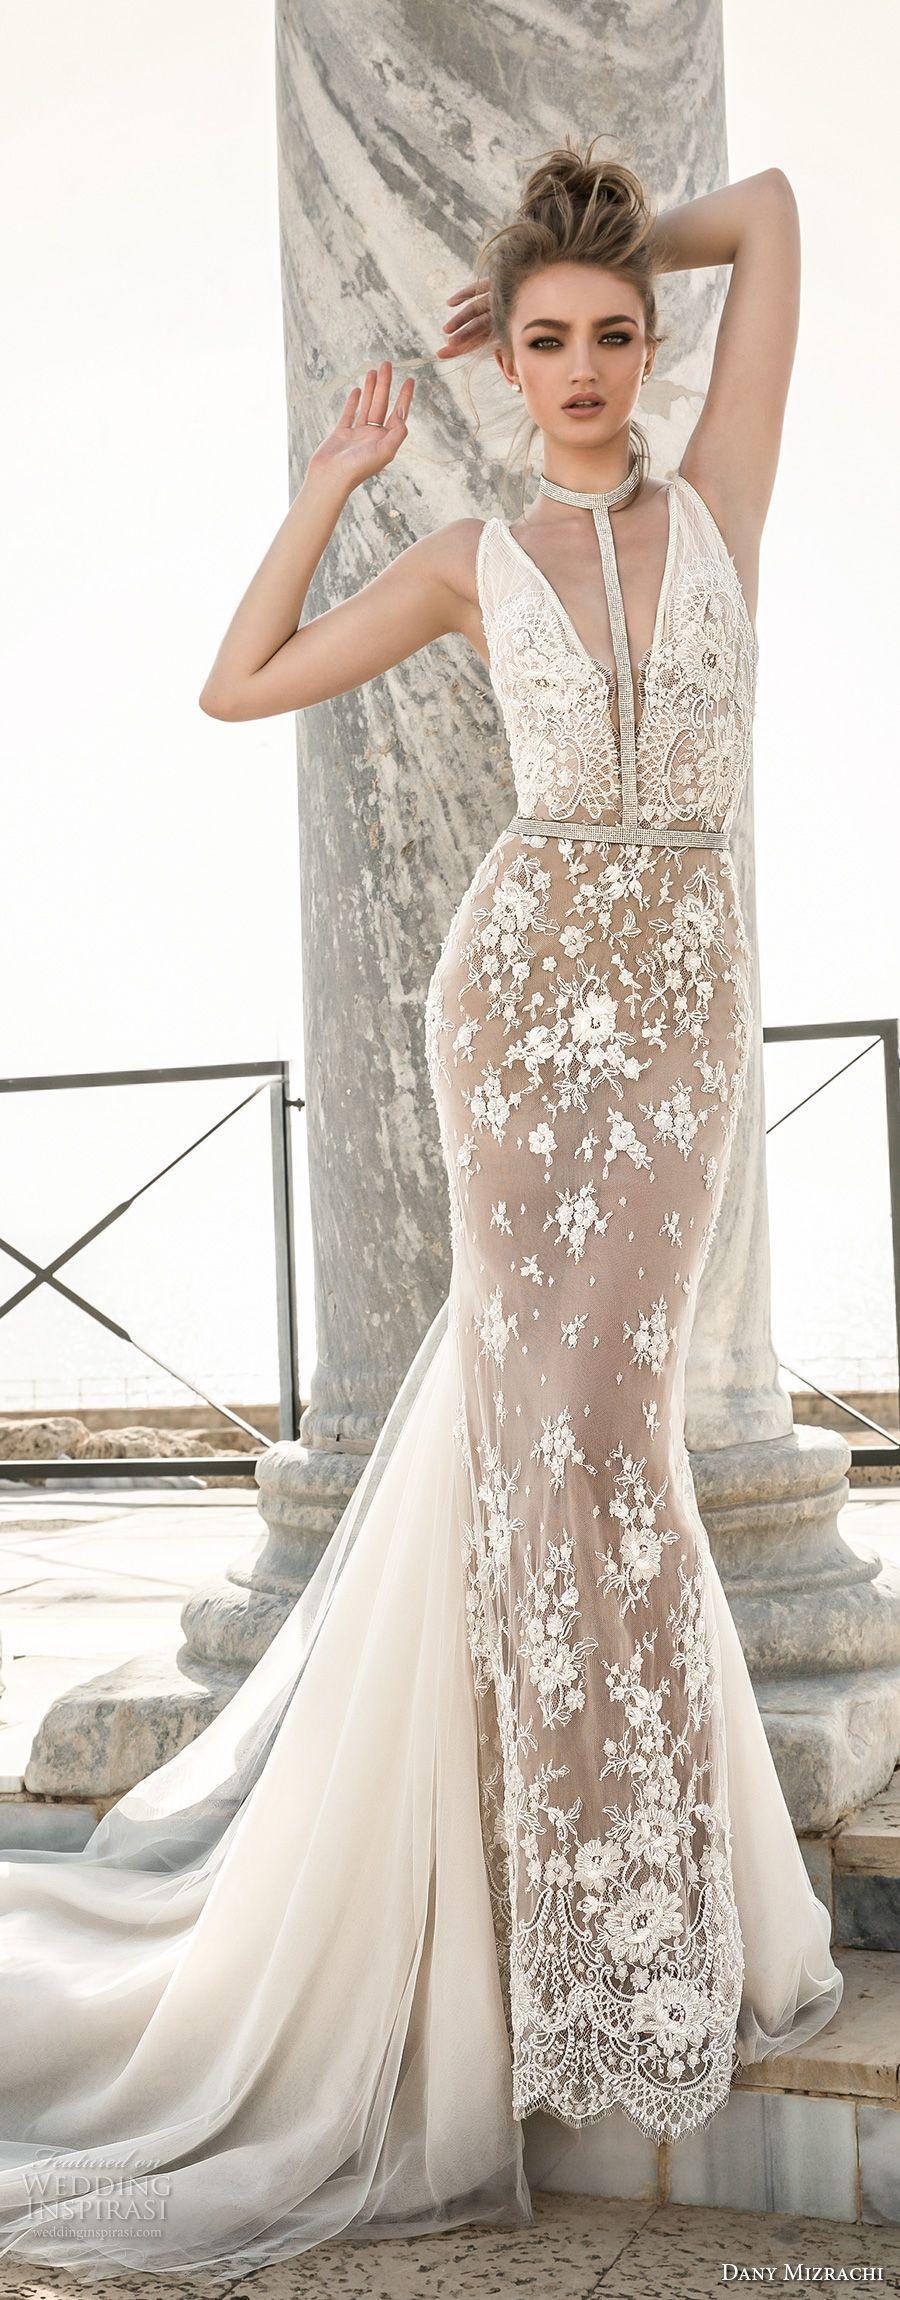 Dany mizrachi 2018 wedding dresses chapel train for Deep back wedding dress